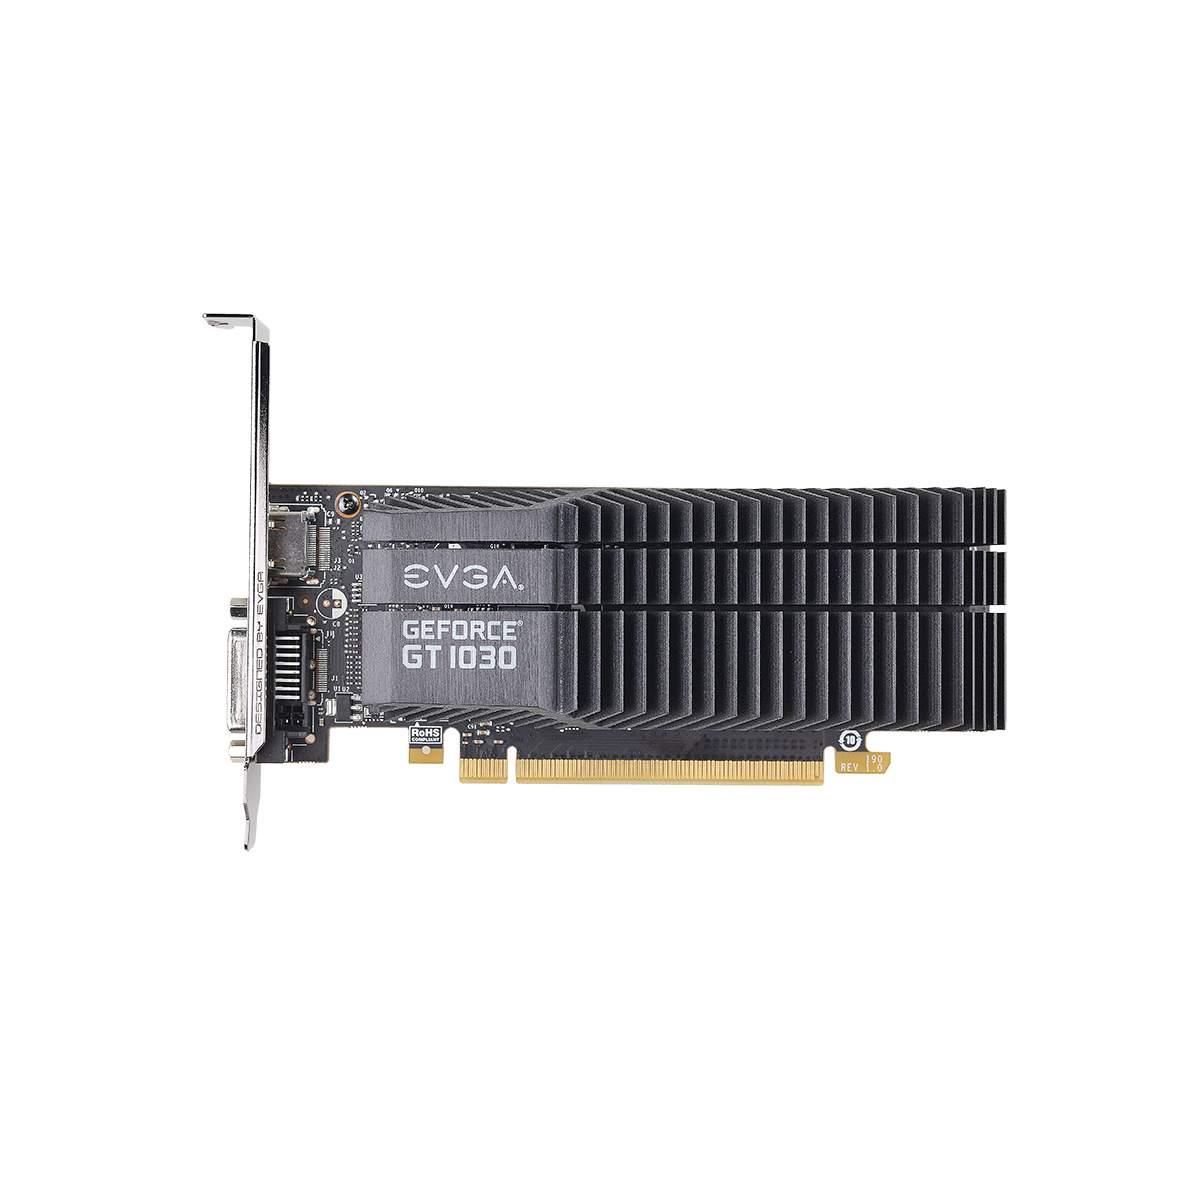 Placa de Video EVGA Geforce GT 1030 SC 2GB DDR5 64 BITS - 02G-P4-6332-KR